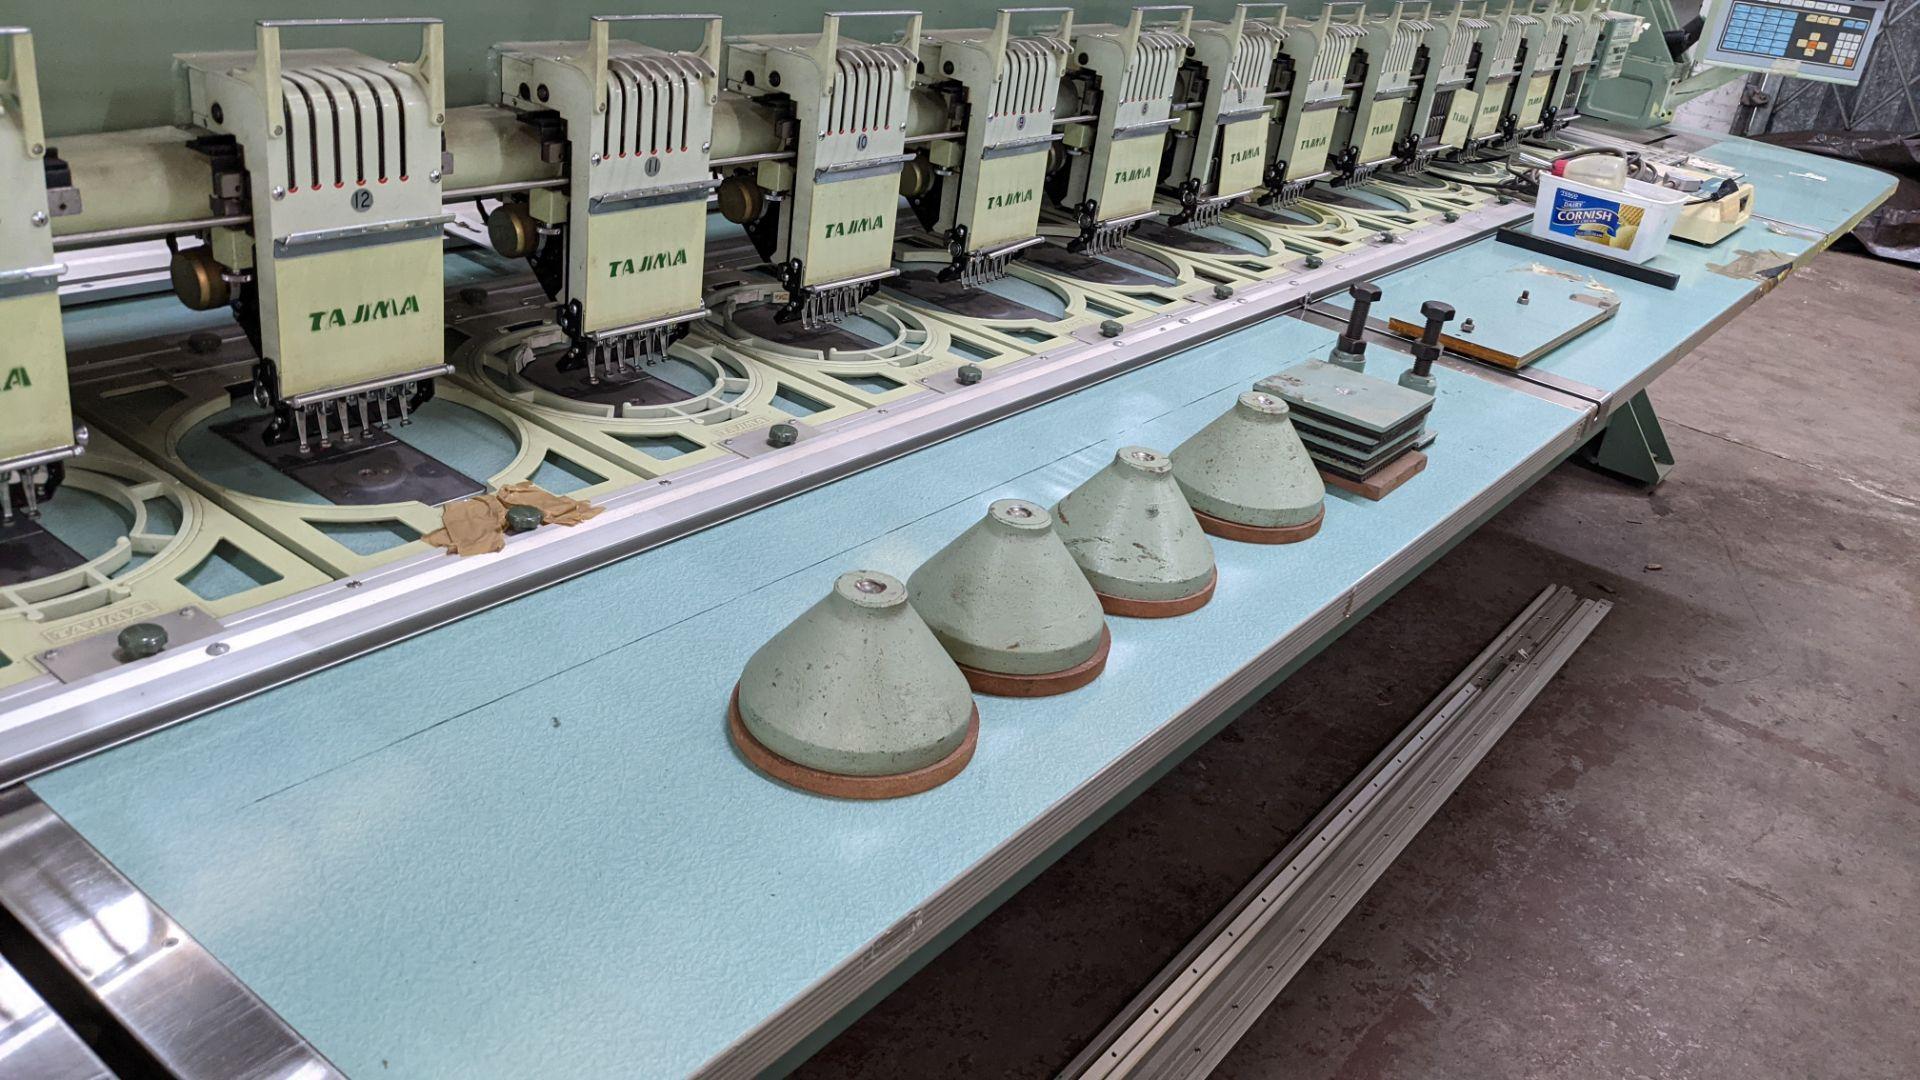 Tokai Tajima electronic 20 head automatic embroidery machine model TMEG-G620, manufacturing number 7 - Image 12 of 19